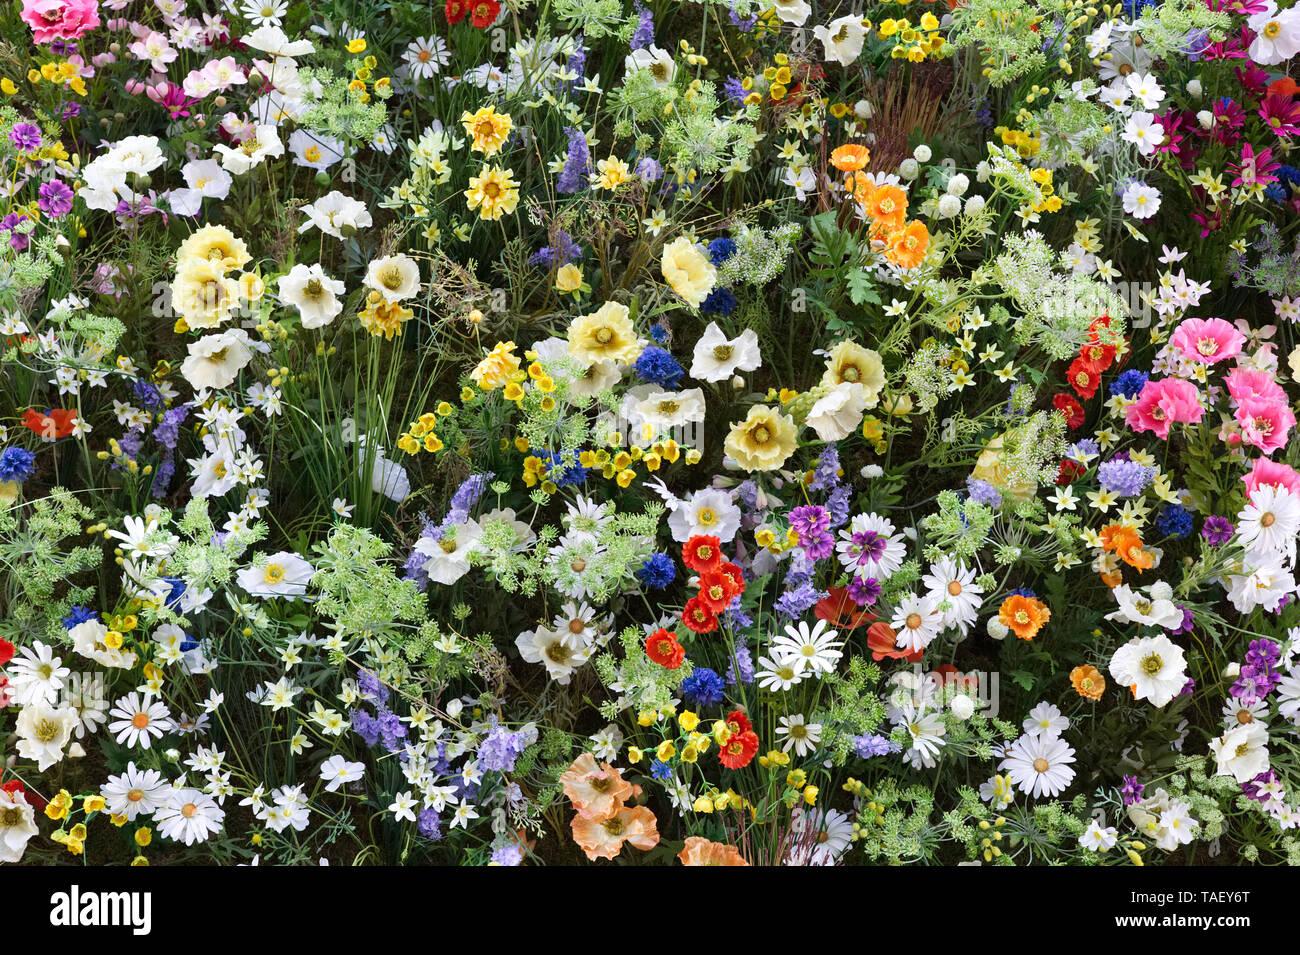 Chelsea in Bloom 2019, The Ivy, Chelsea Garden, wildflowers Stock Photo